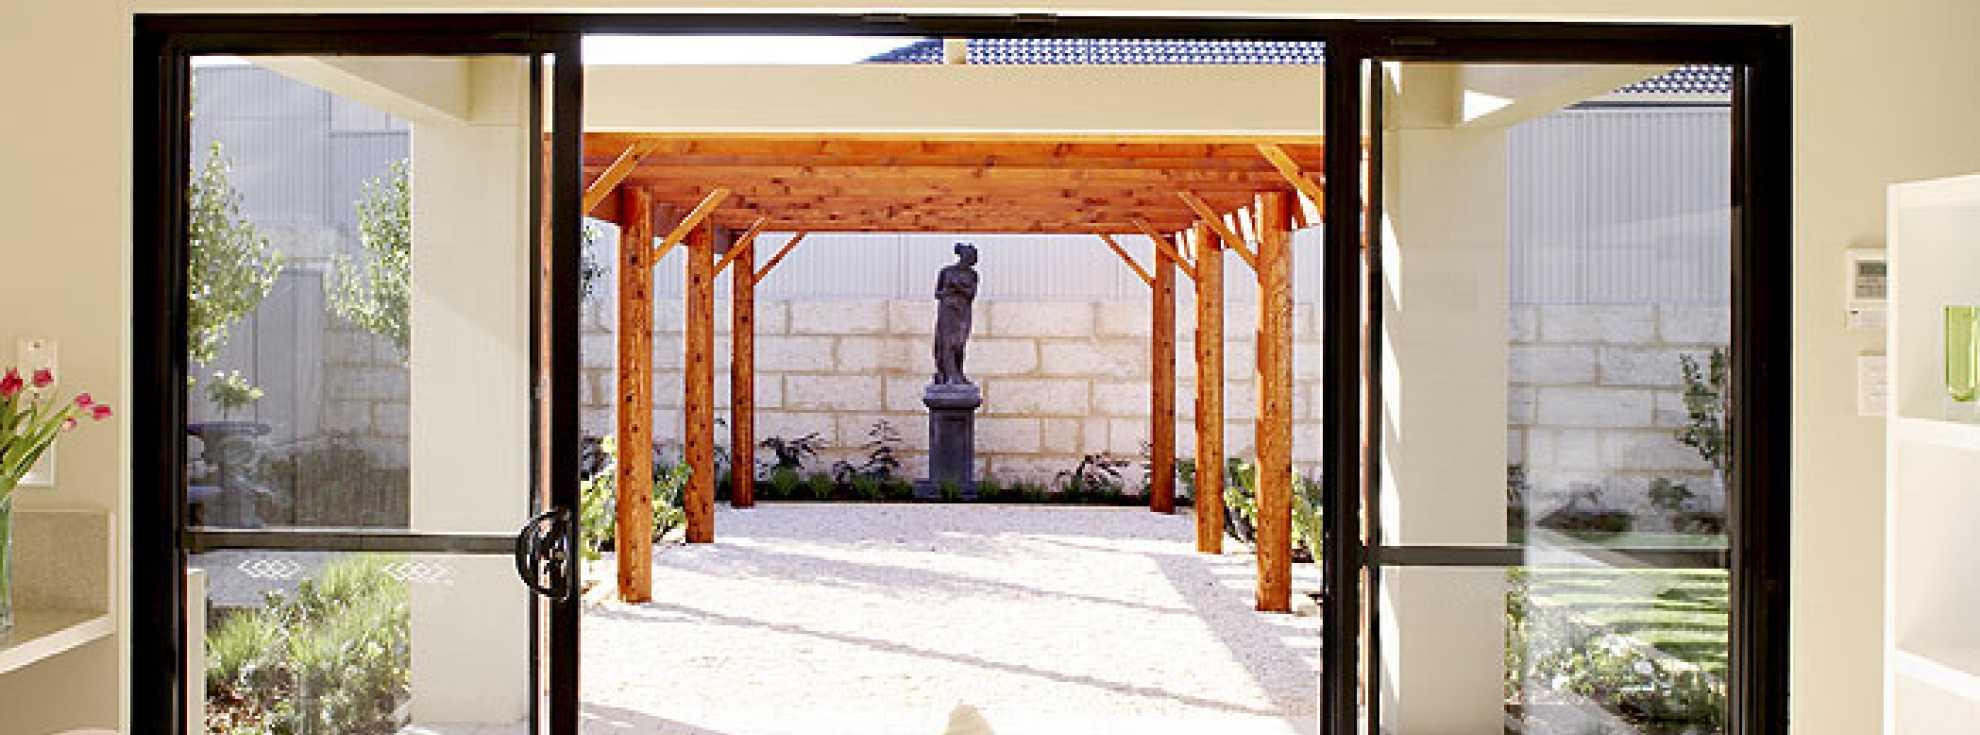 New Luxury Display Home Designers Perth Double Storey